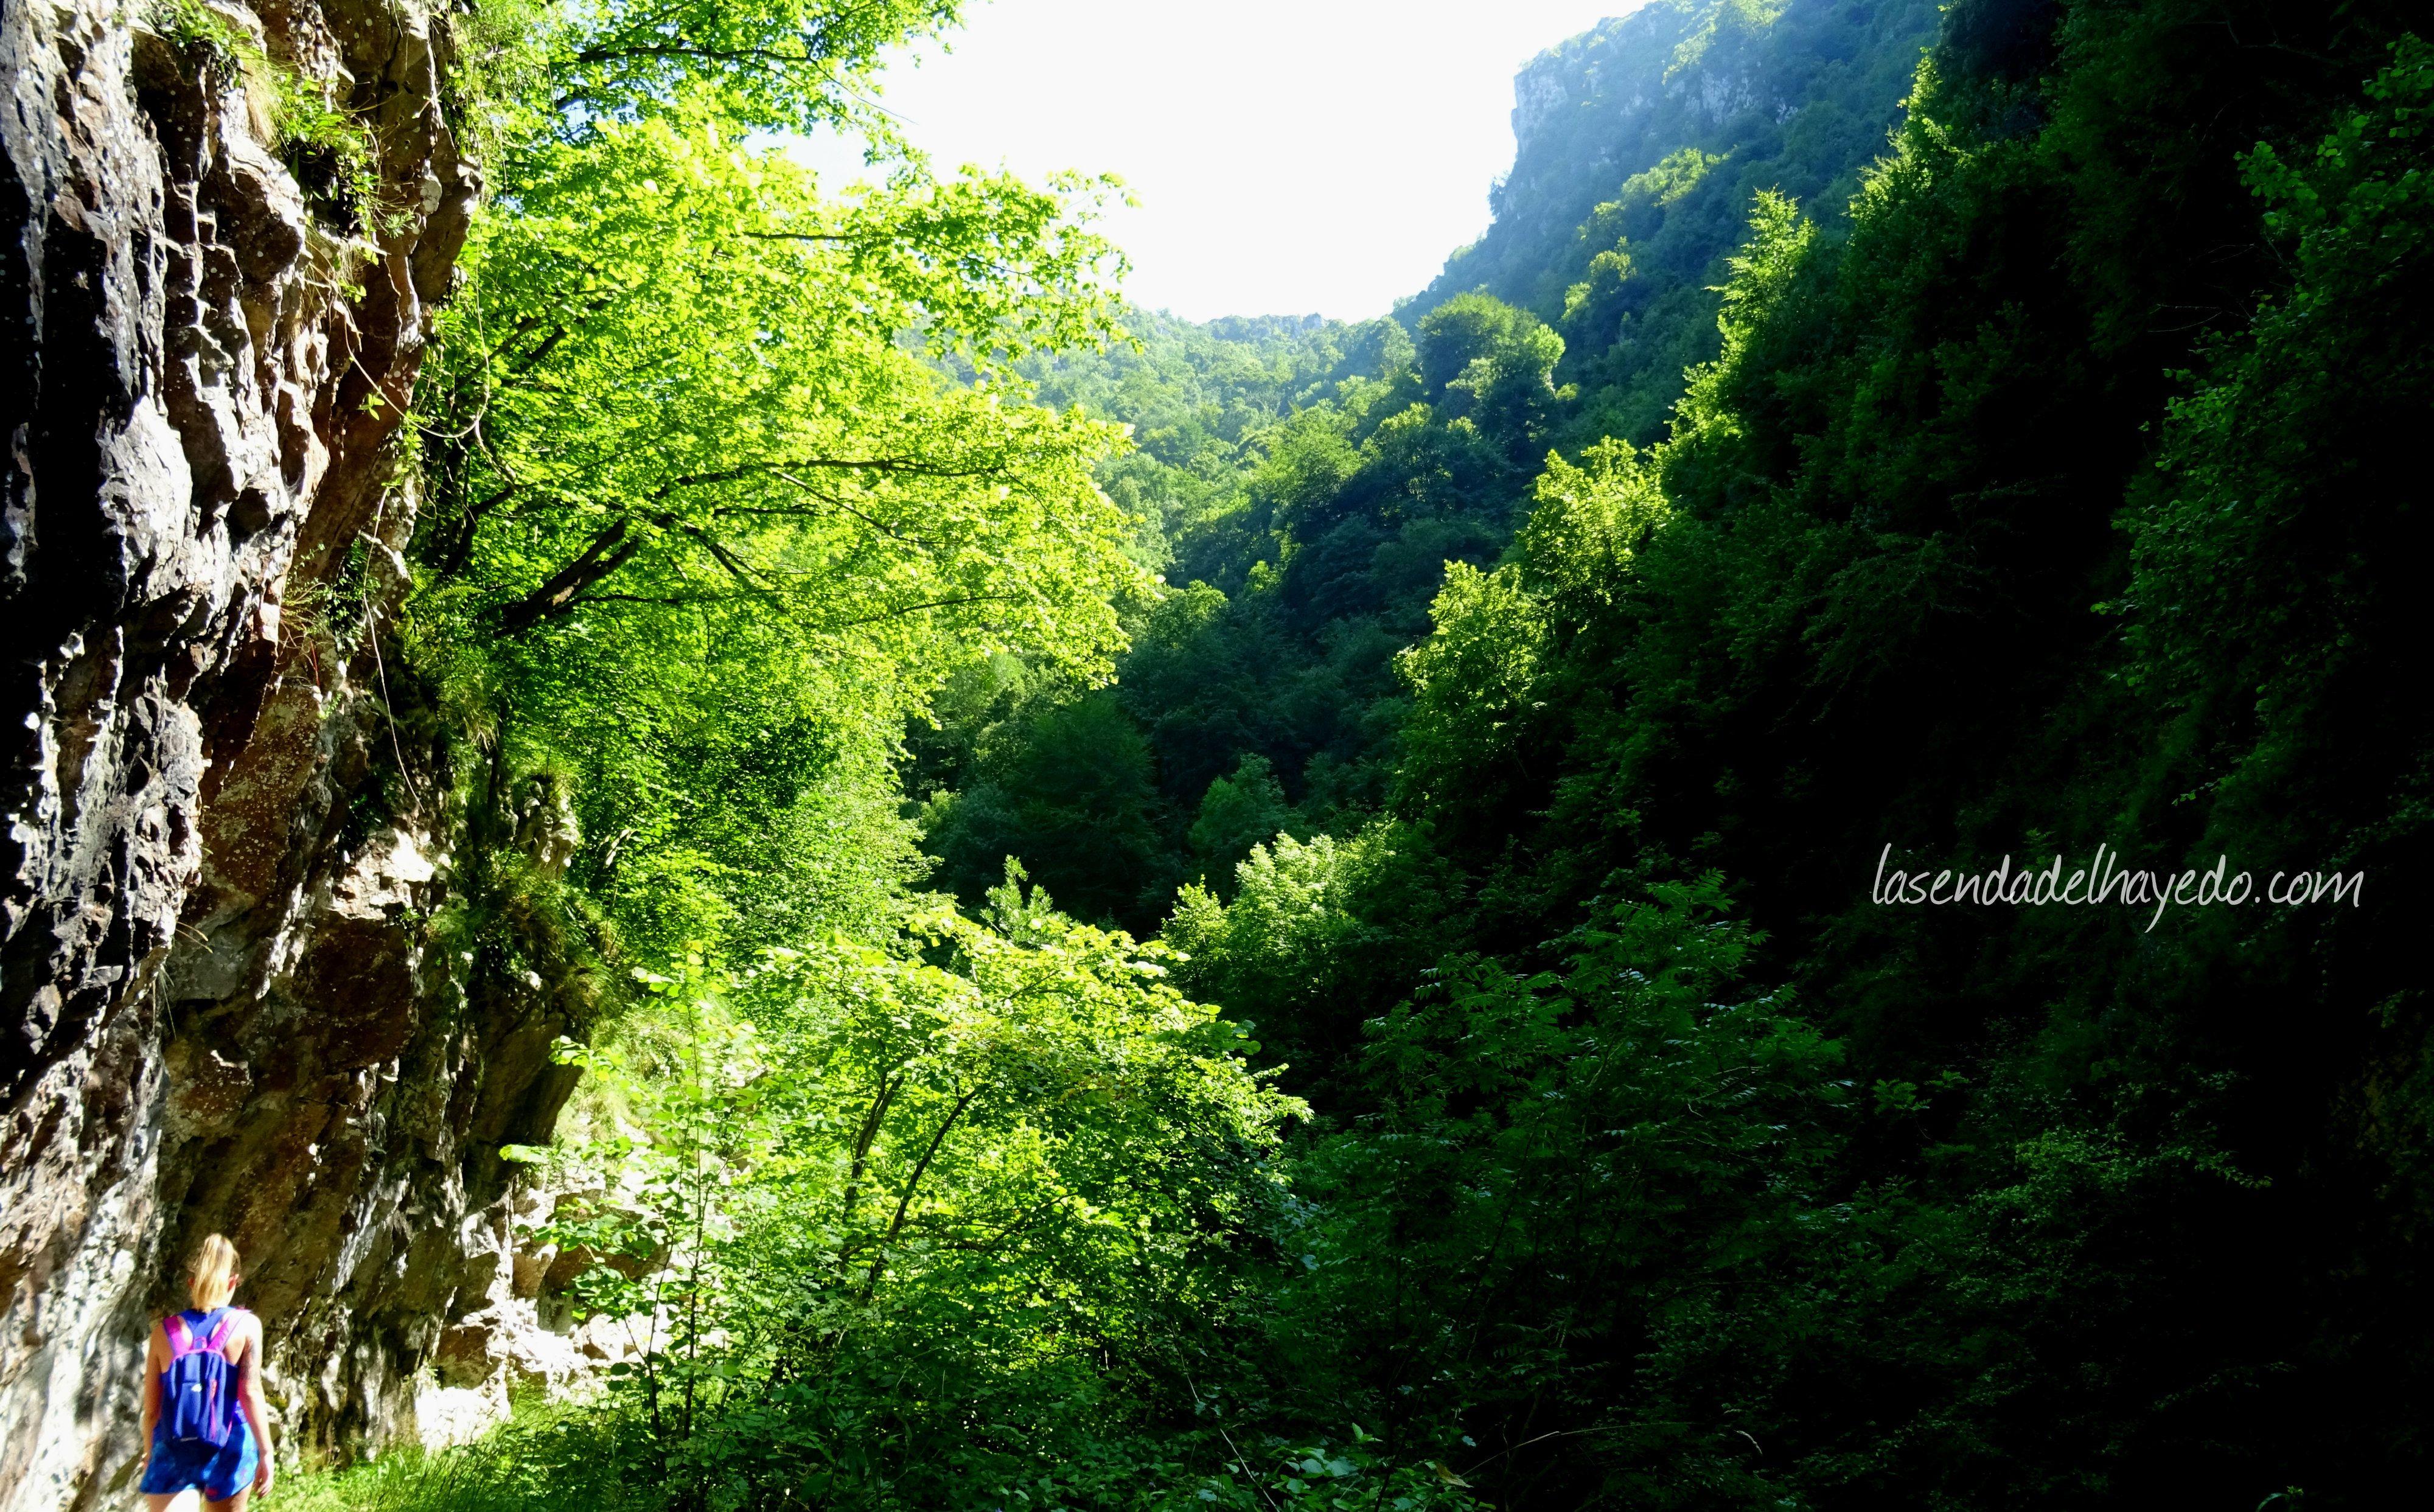 ruta de las xanas asturias